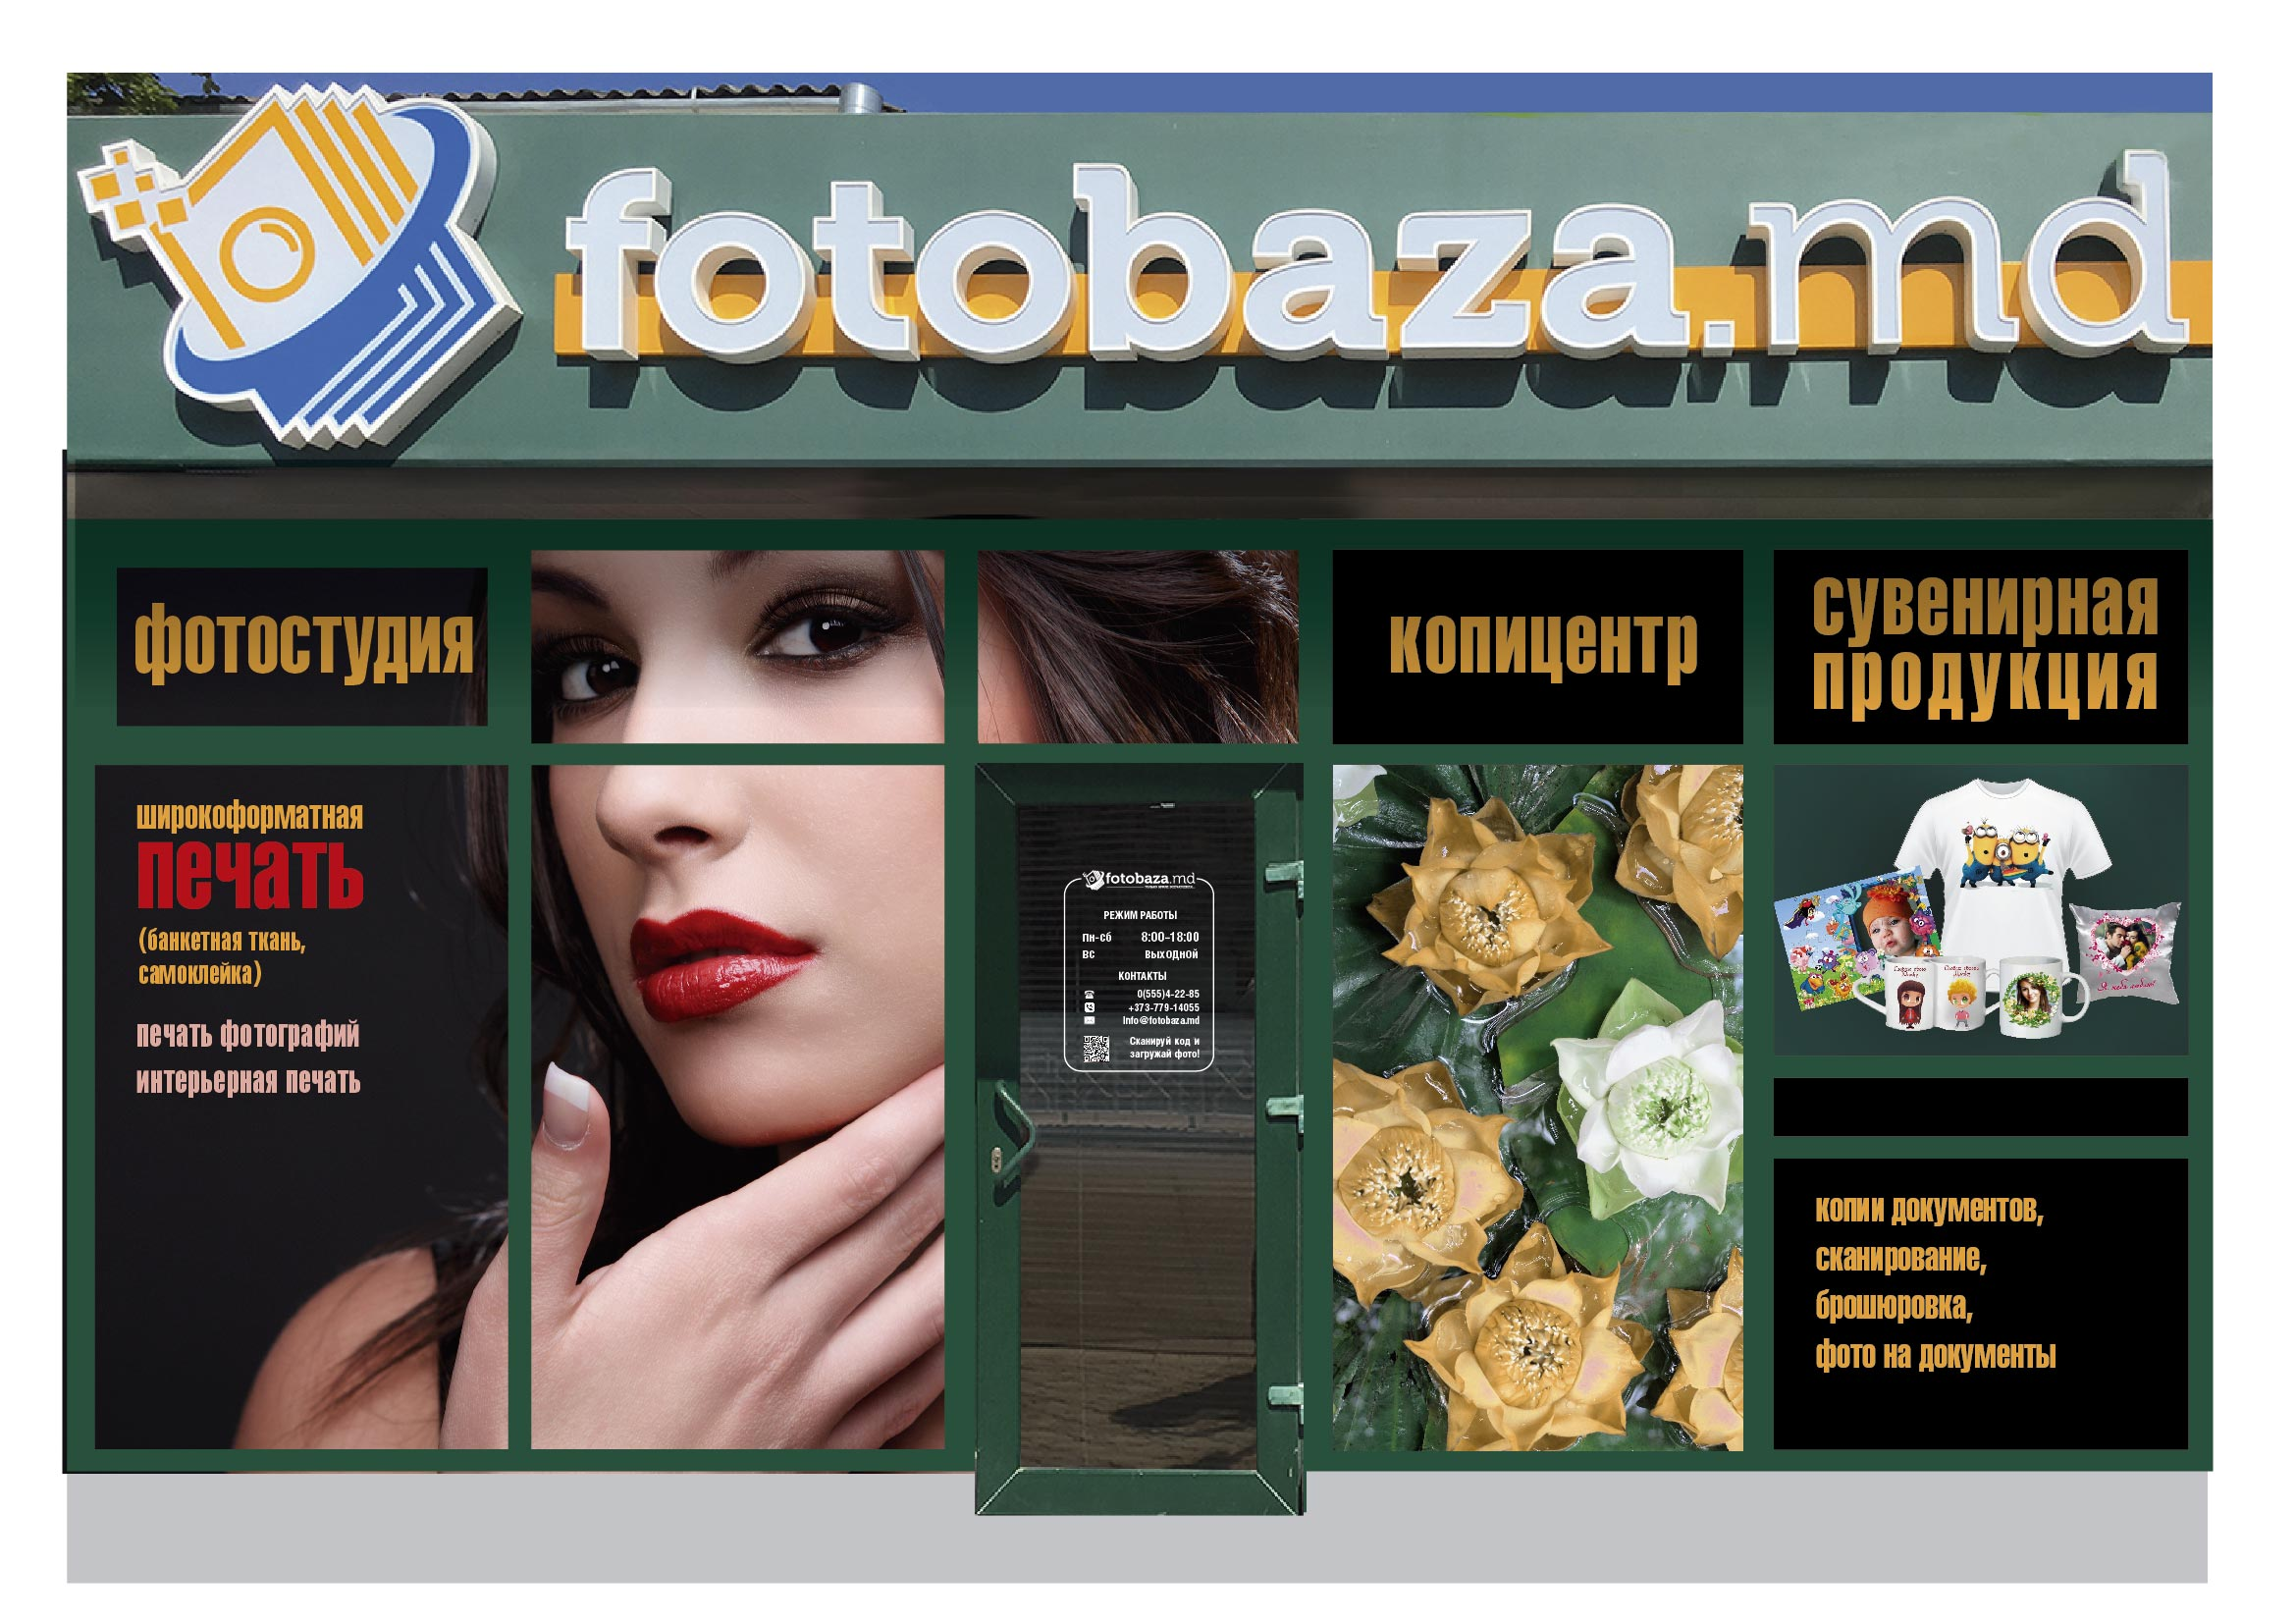 наружная реклама фасада КОПИЦЕНТР фото f_5955b1e5158baf8b.jpg